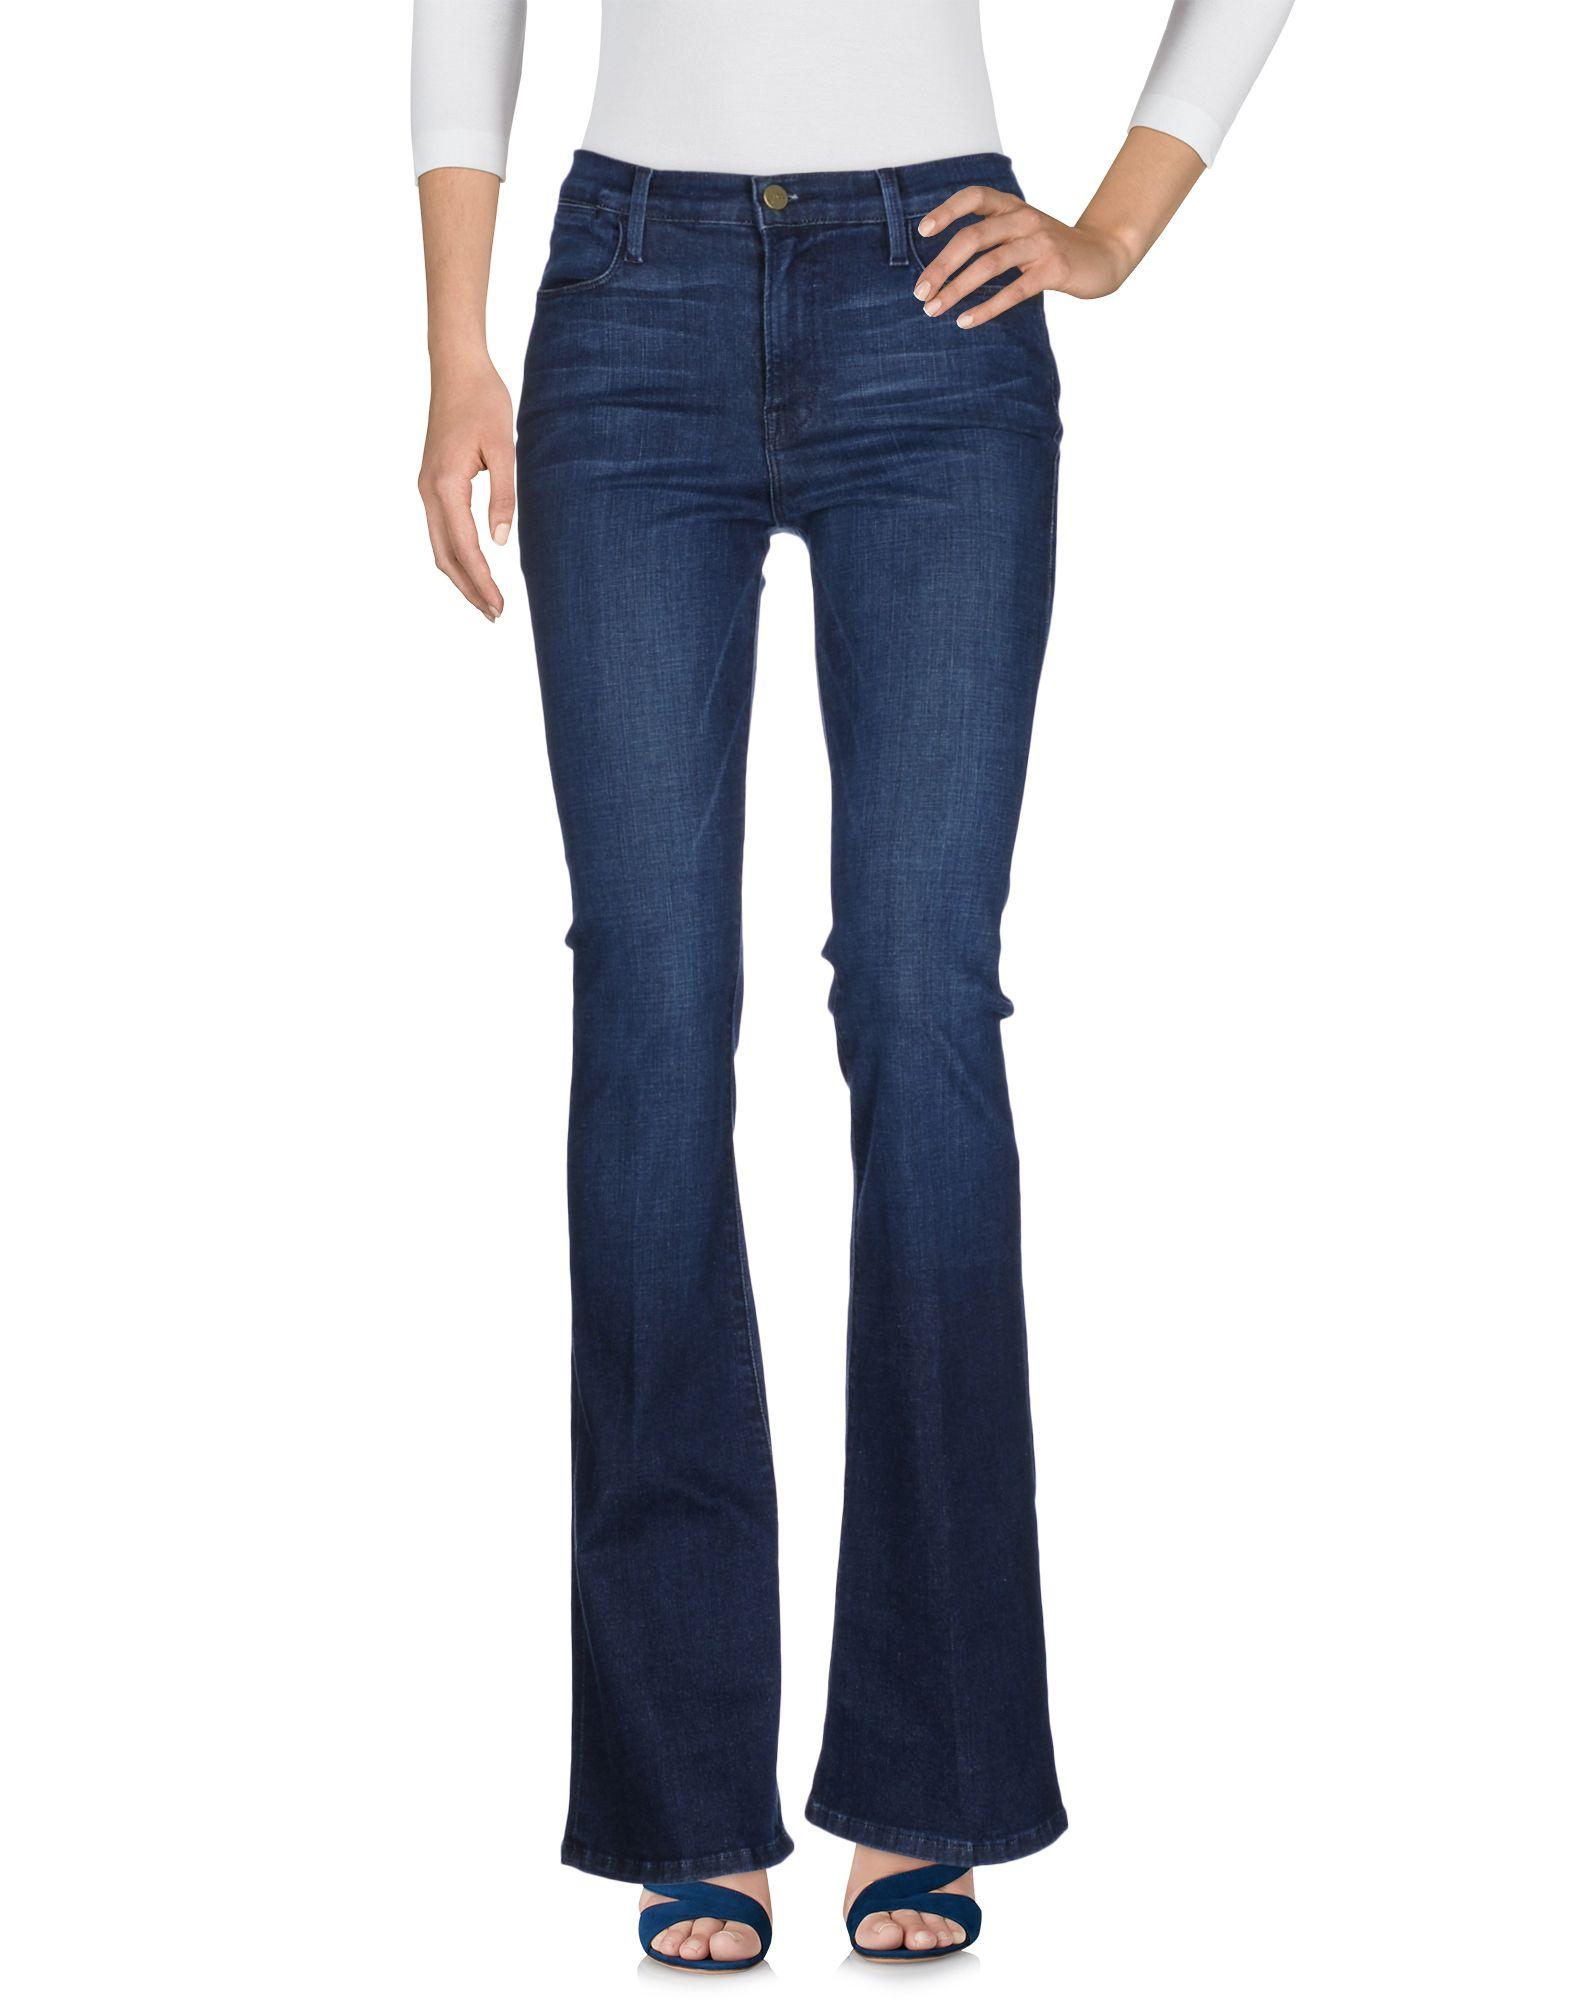 FRAME Damen Jeanshose Farbe Blau Größe 8 - broschei